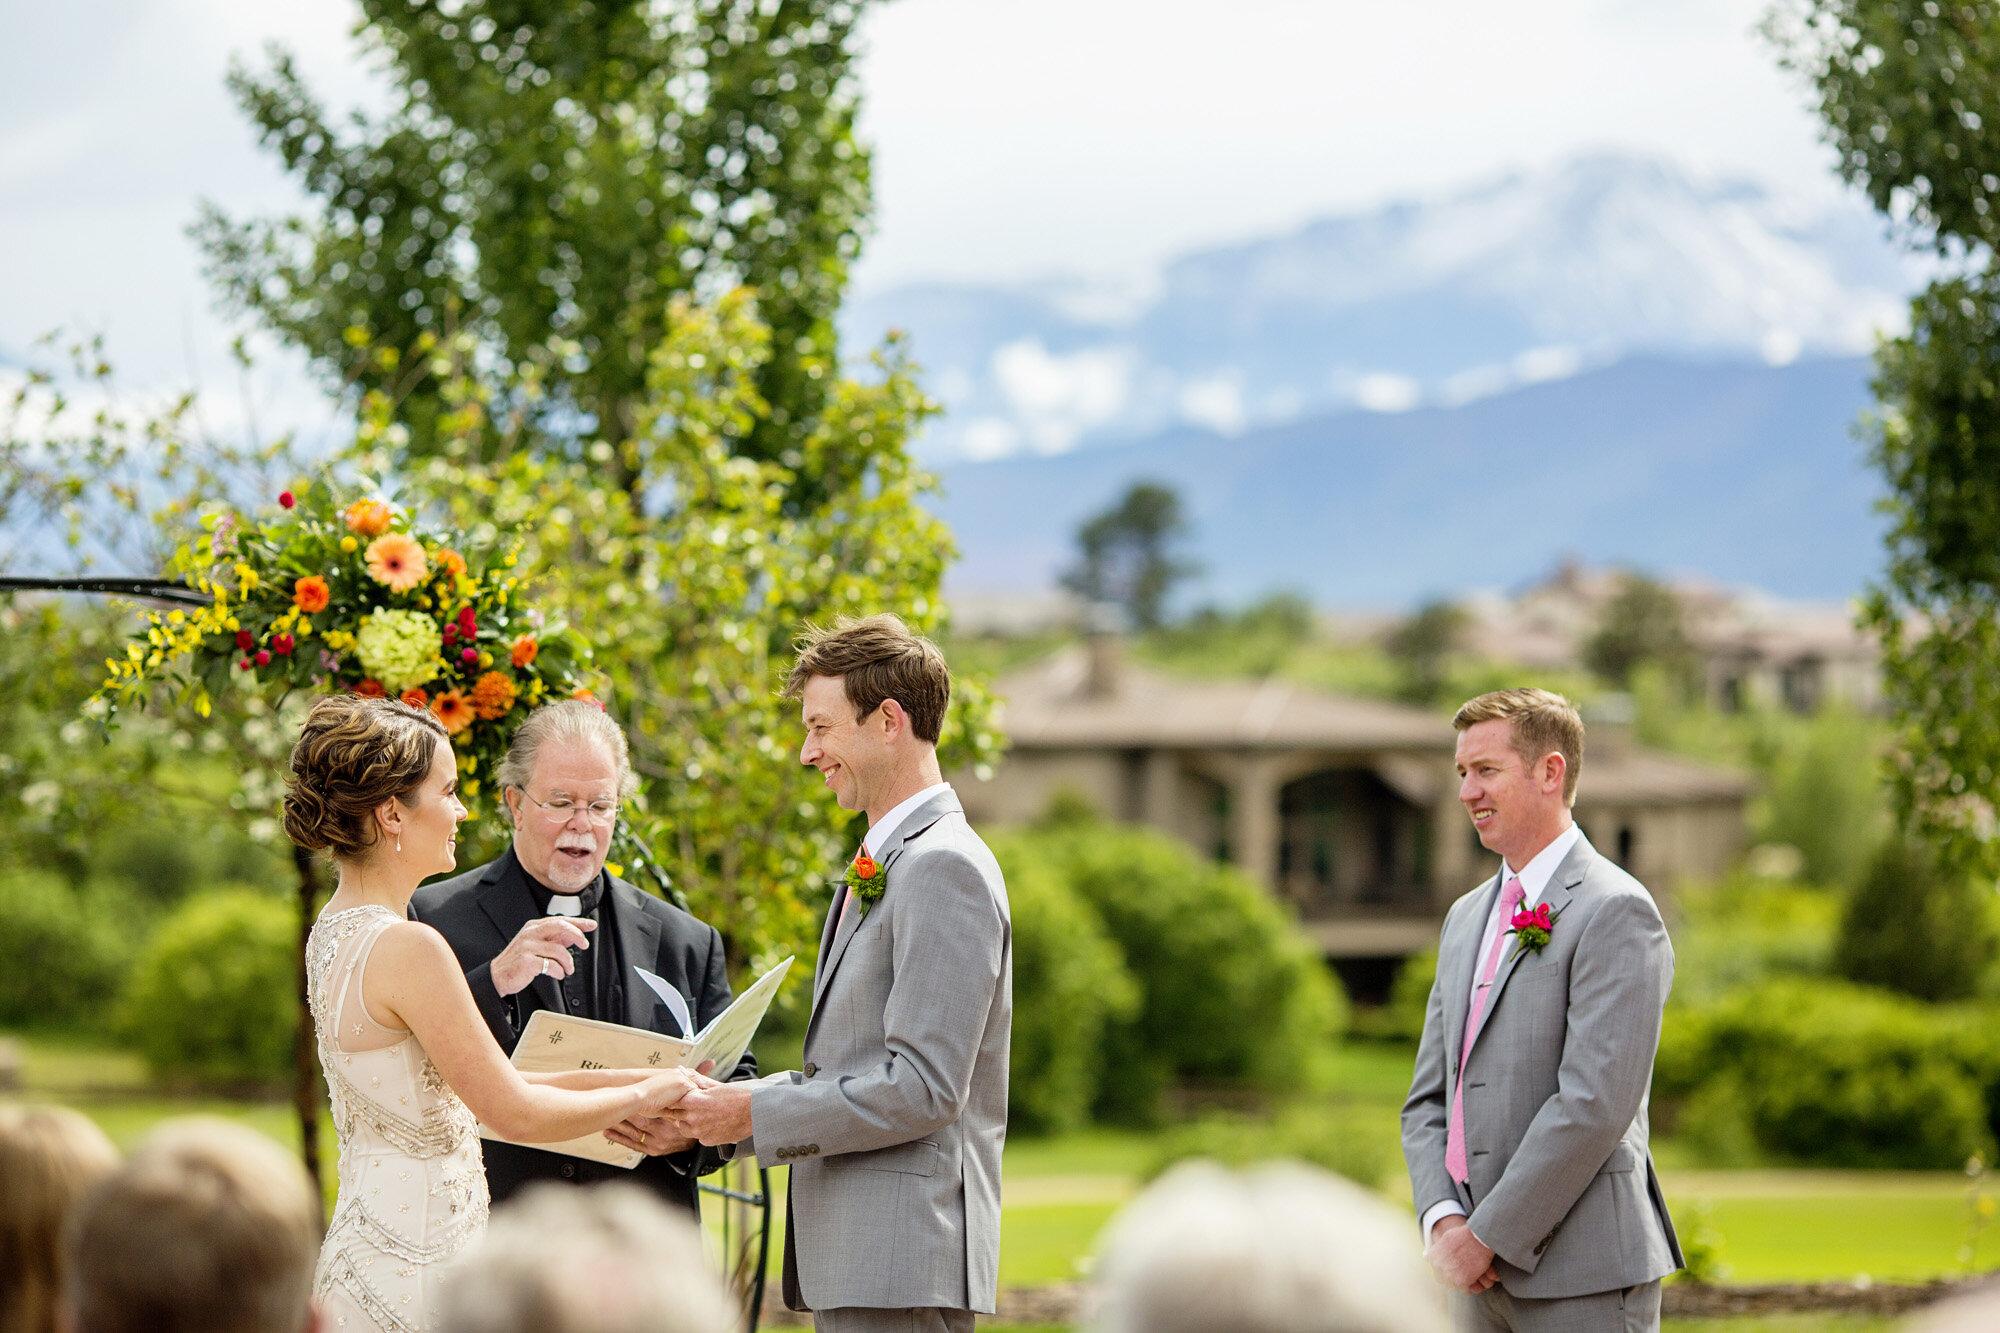 Seriously_Sabrina_Photography_Colorado_Springs_Club_at_Flying_Horse_Destination_Wedding_ODwyer55.jpg